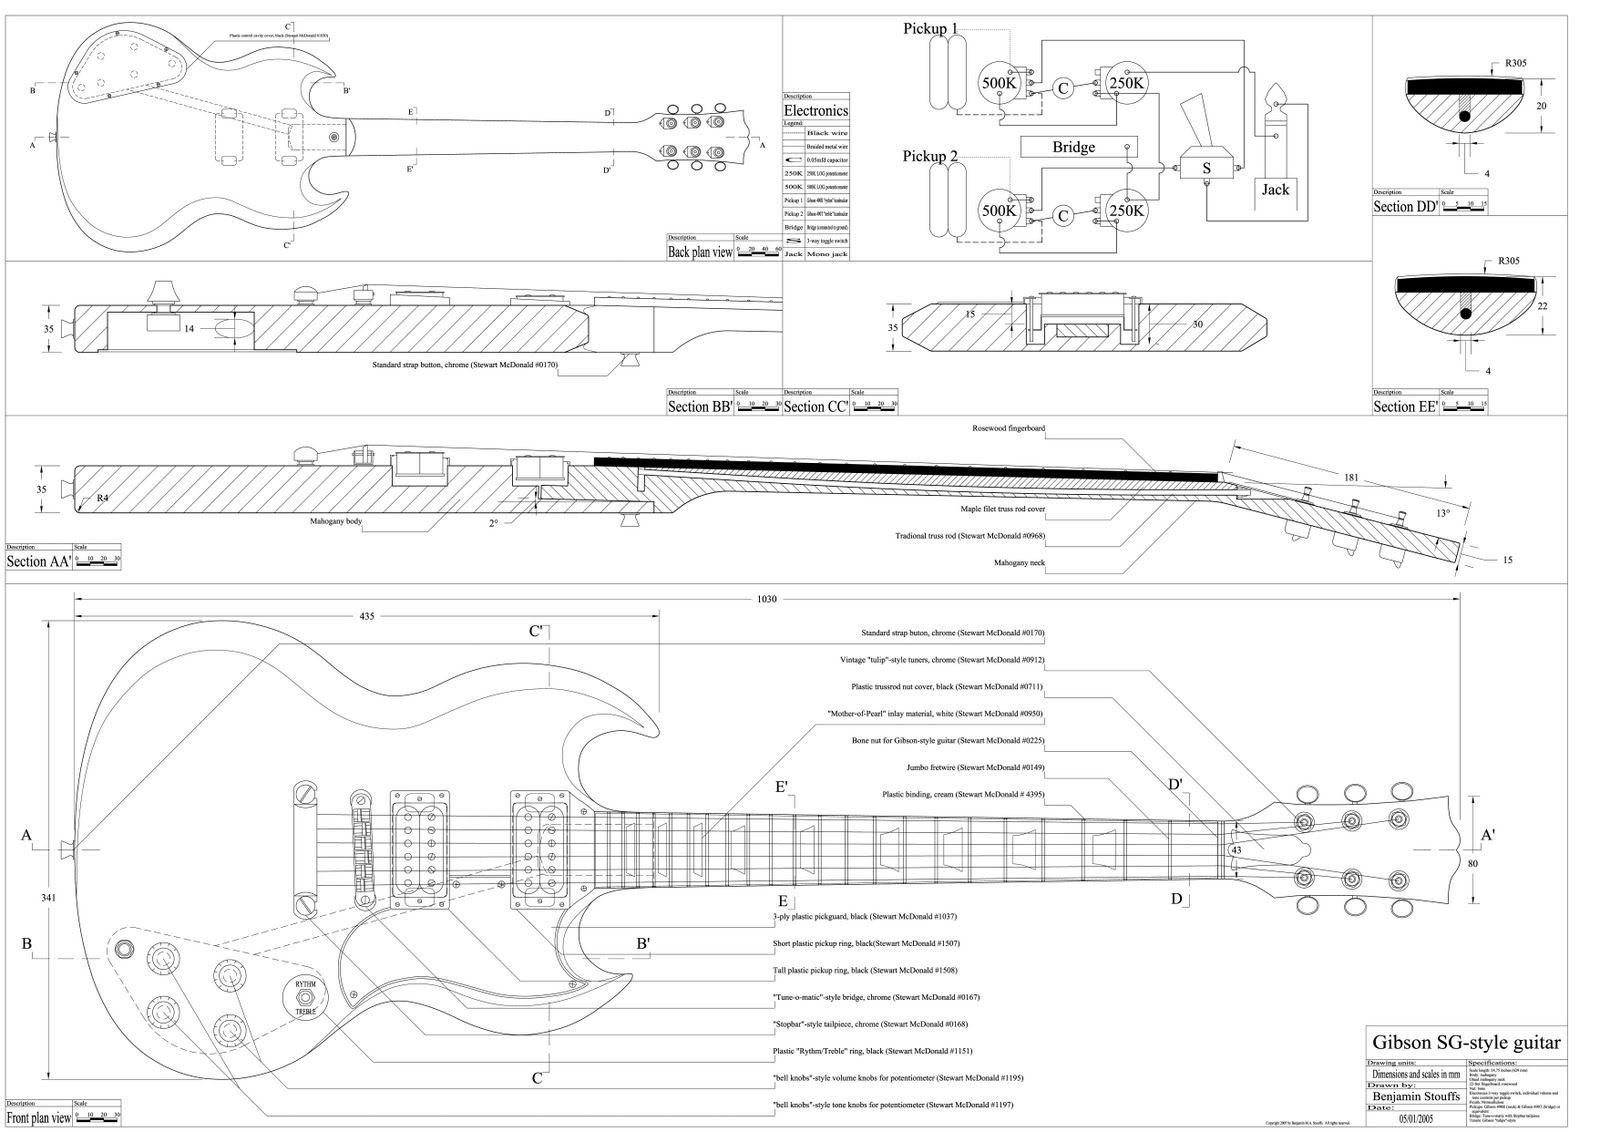 fnder blue print - Pesquisa Google | guitars | Pinterest | Guitarras ...